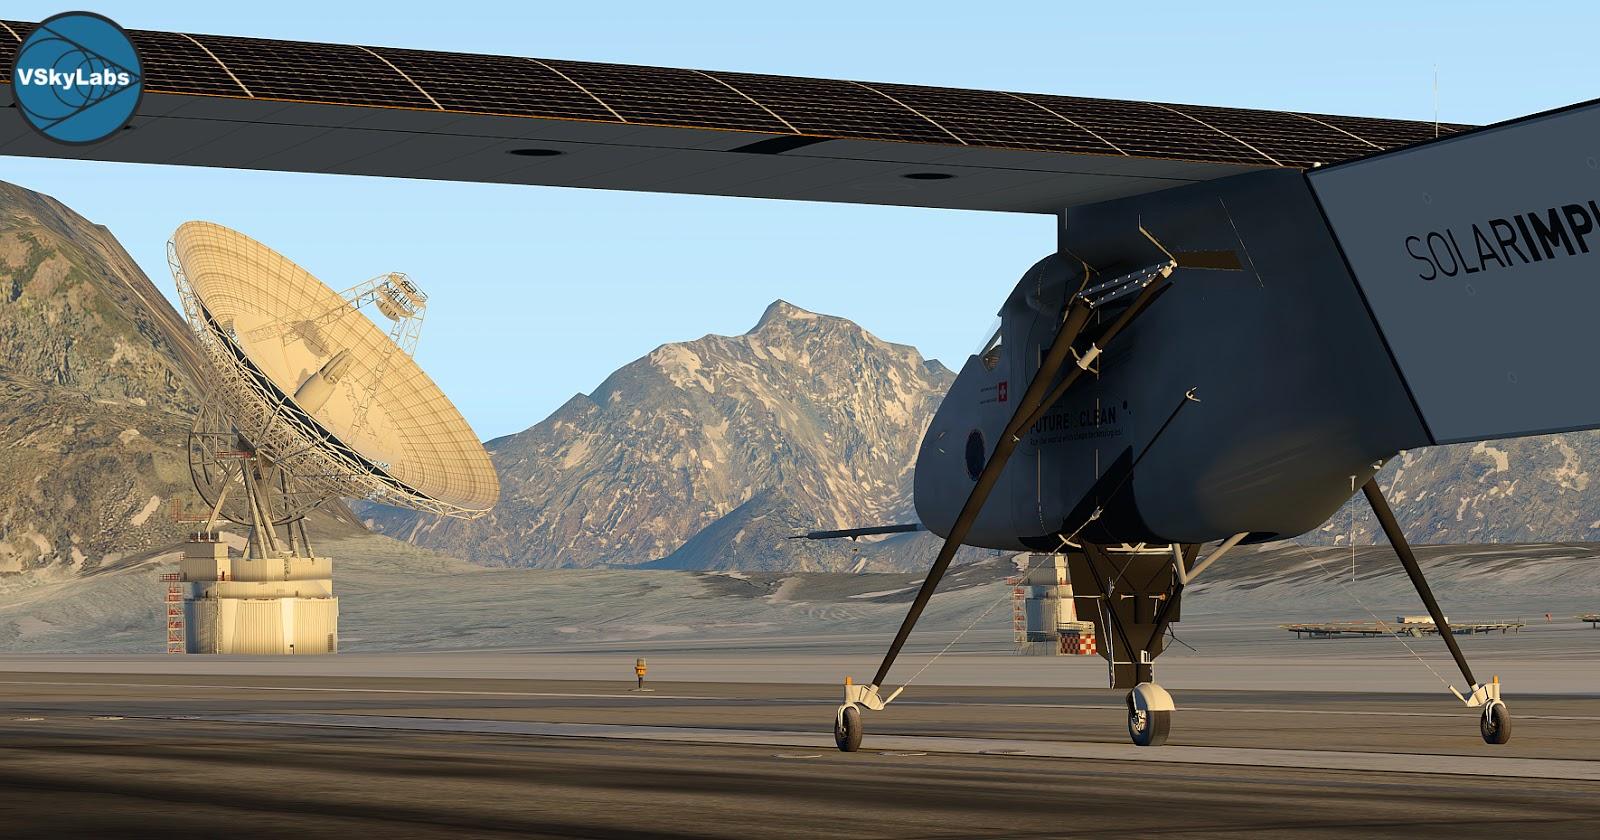 COMING SOON! VSKYLABS Solar Impulse 2